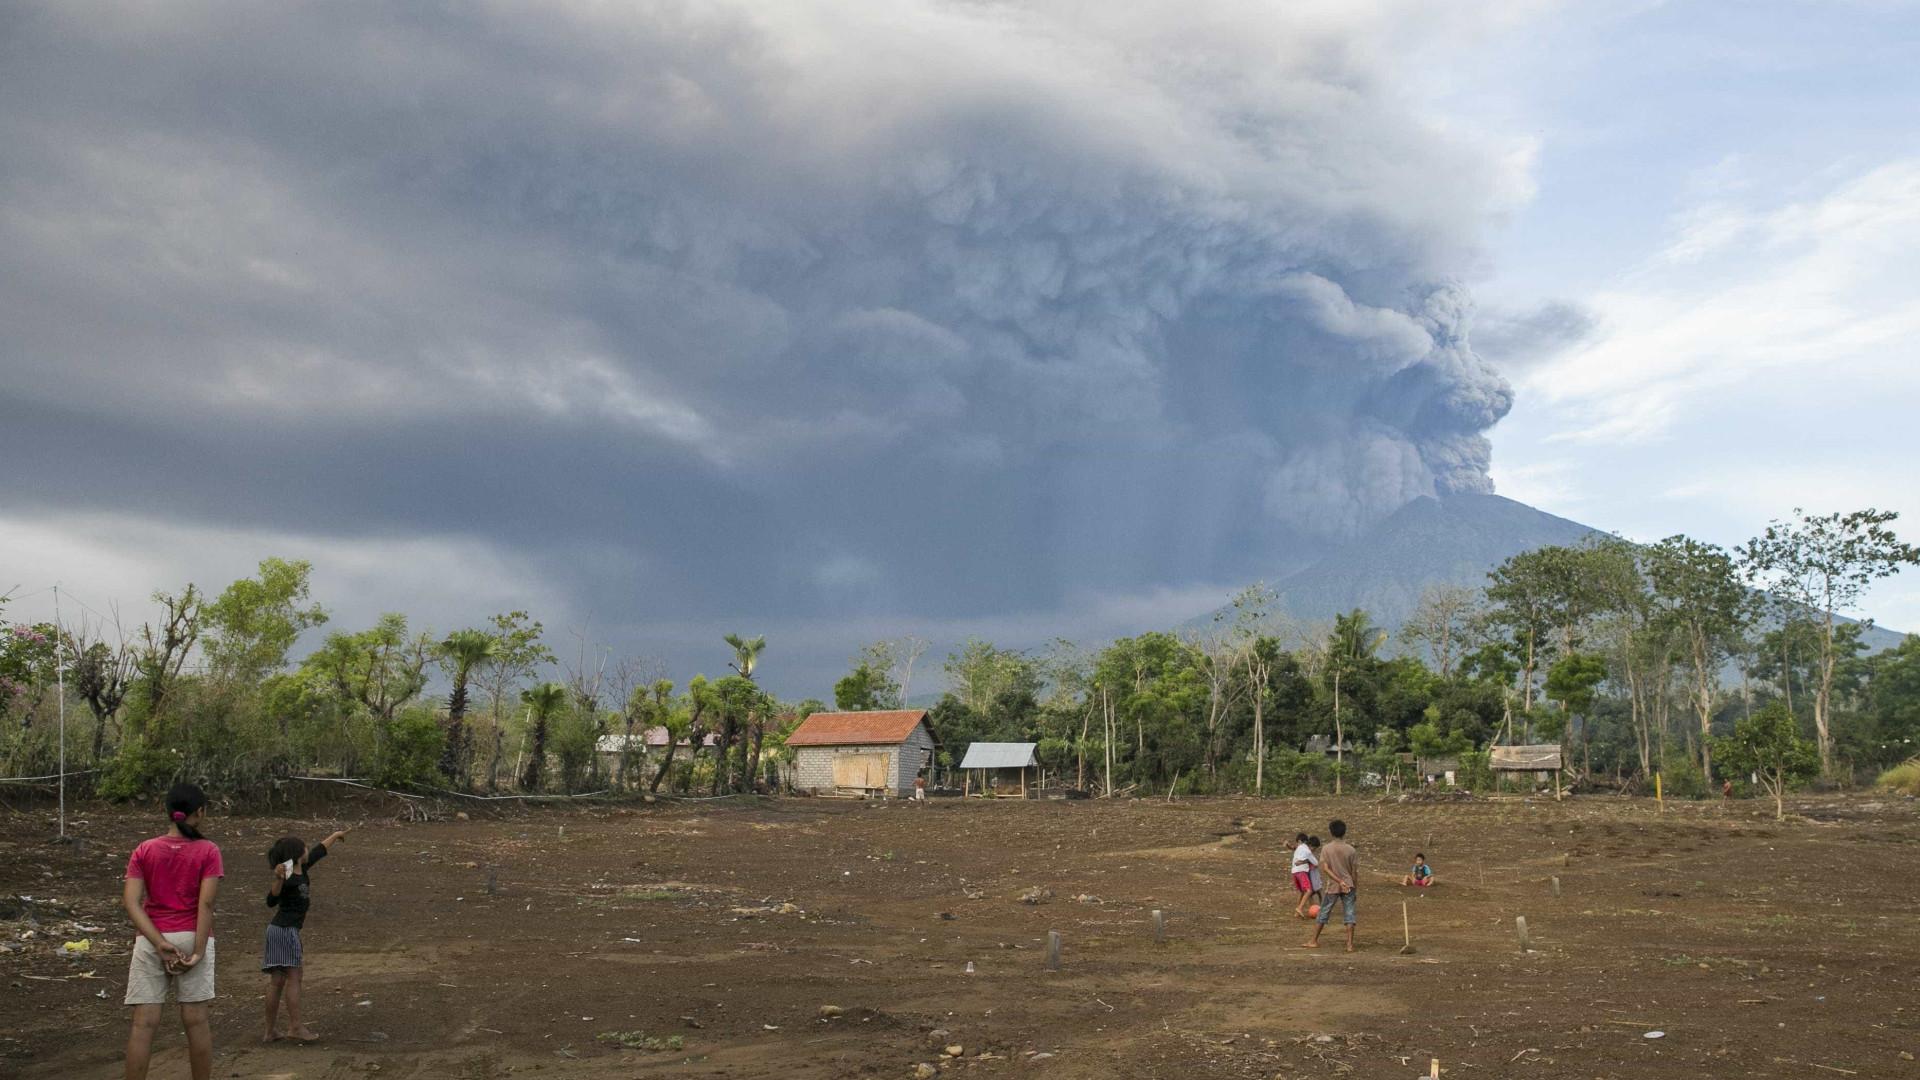 Aeroporto Bali : Notícias ao minuto bali aeroporto encerrado pelo segundo dia